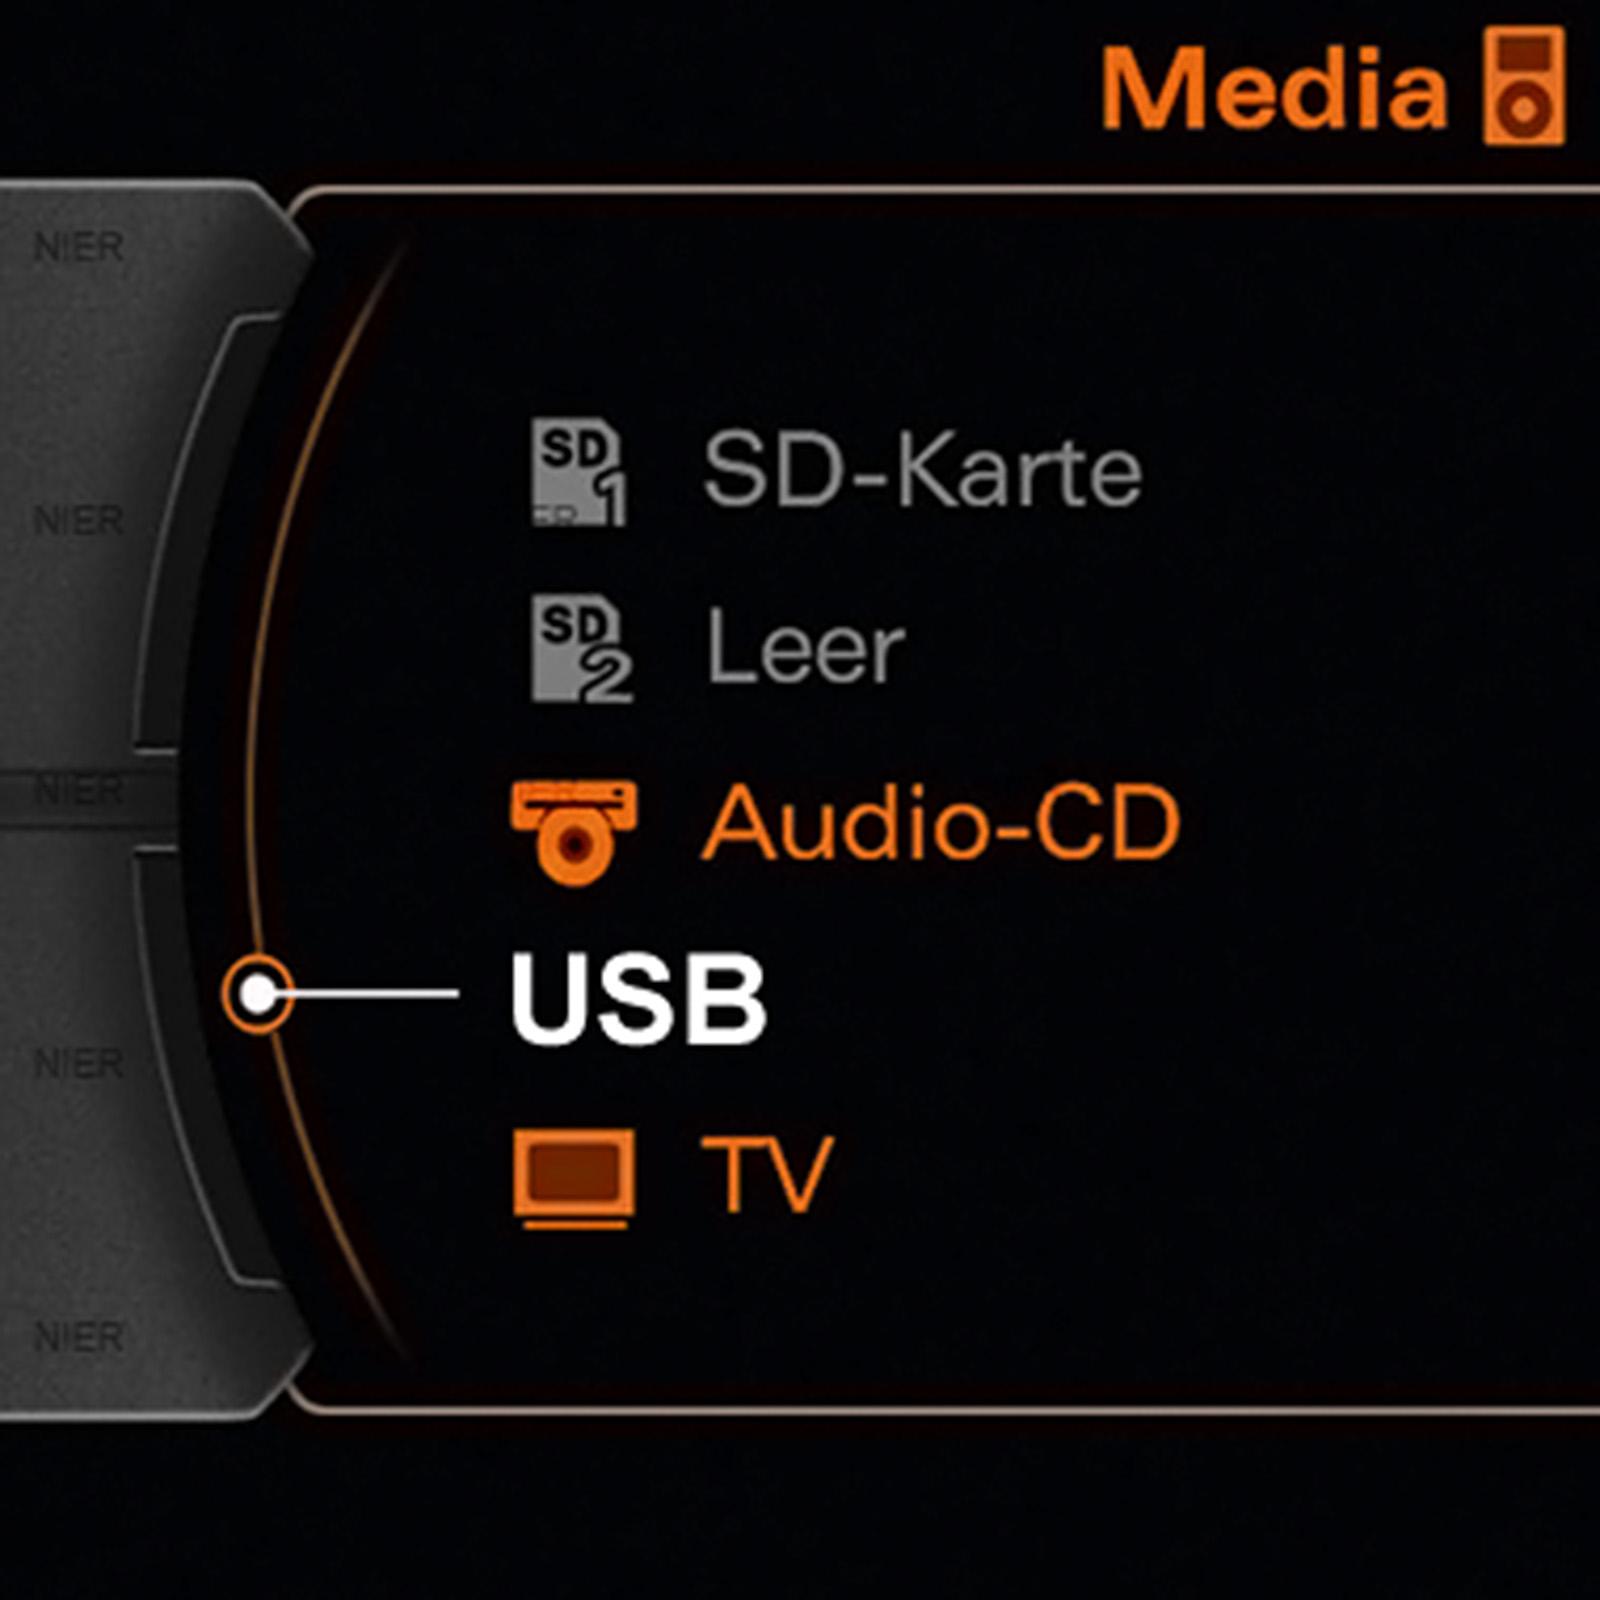 AMI MMI USB Adapter Cable For Audi A3 A4 S4 A5 A6 S6 A8 S8